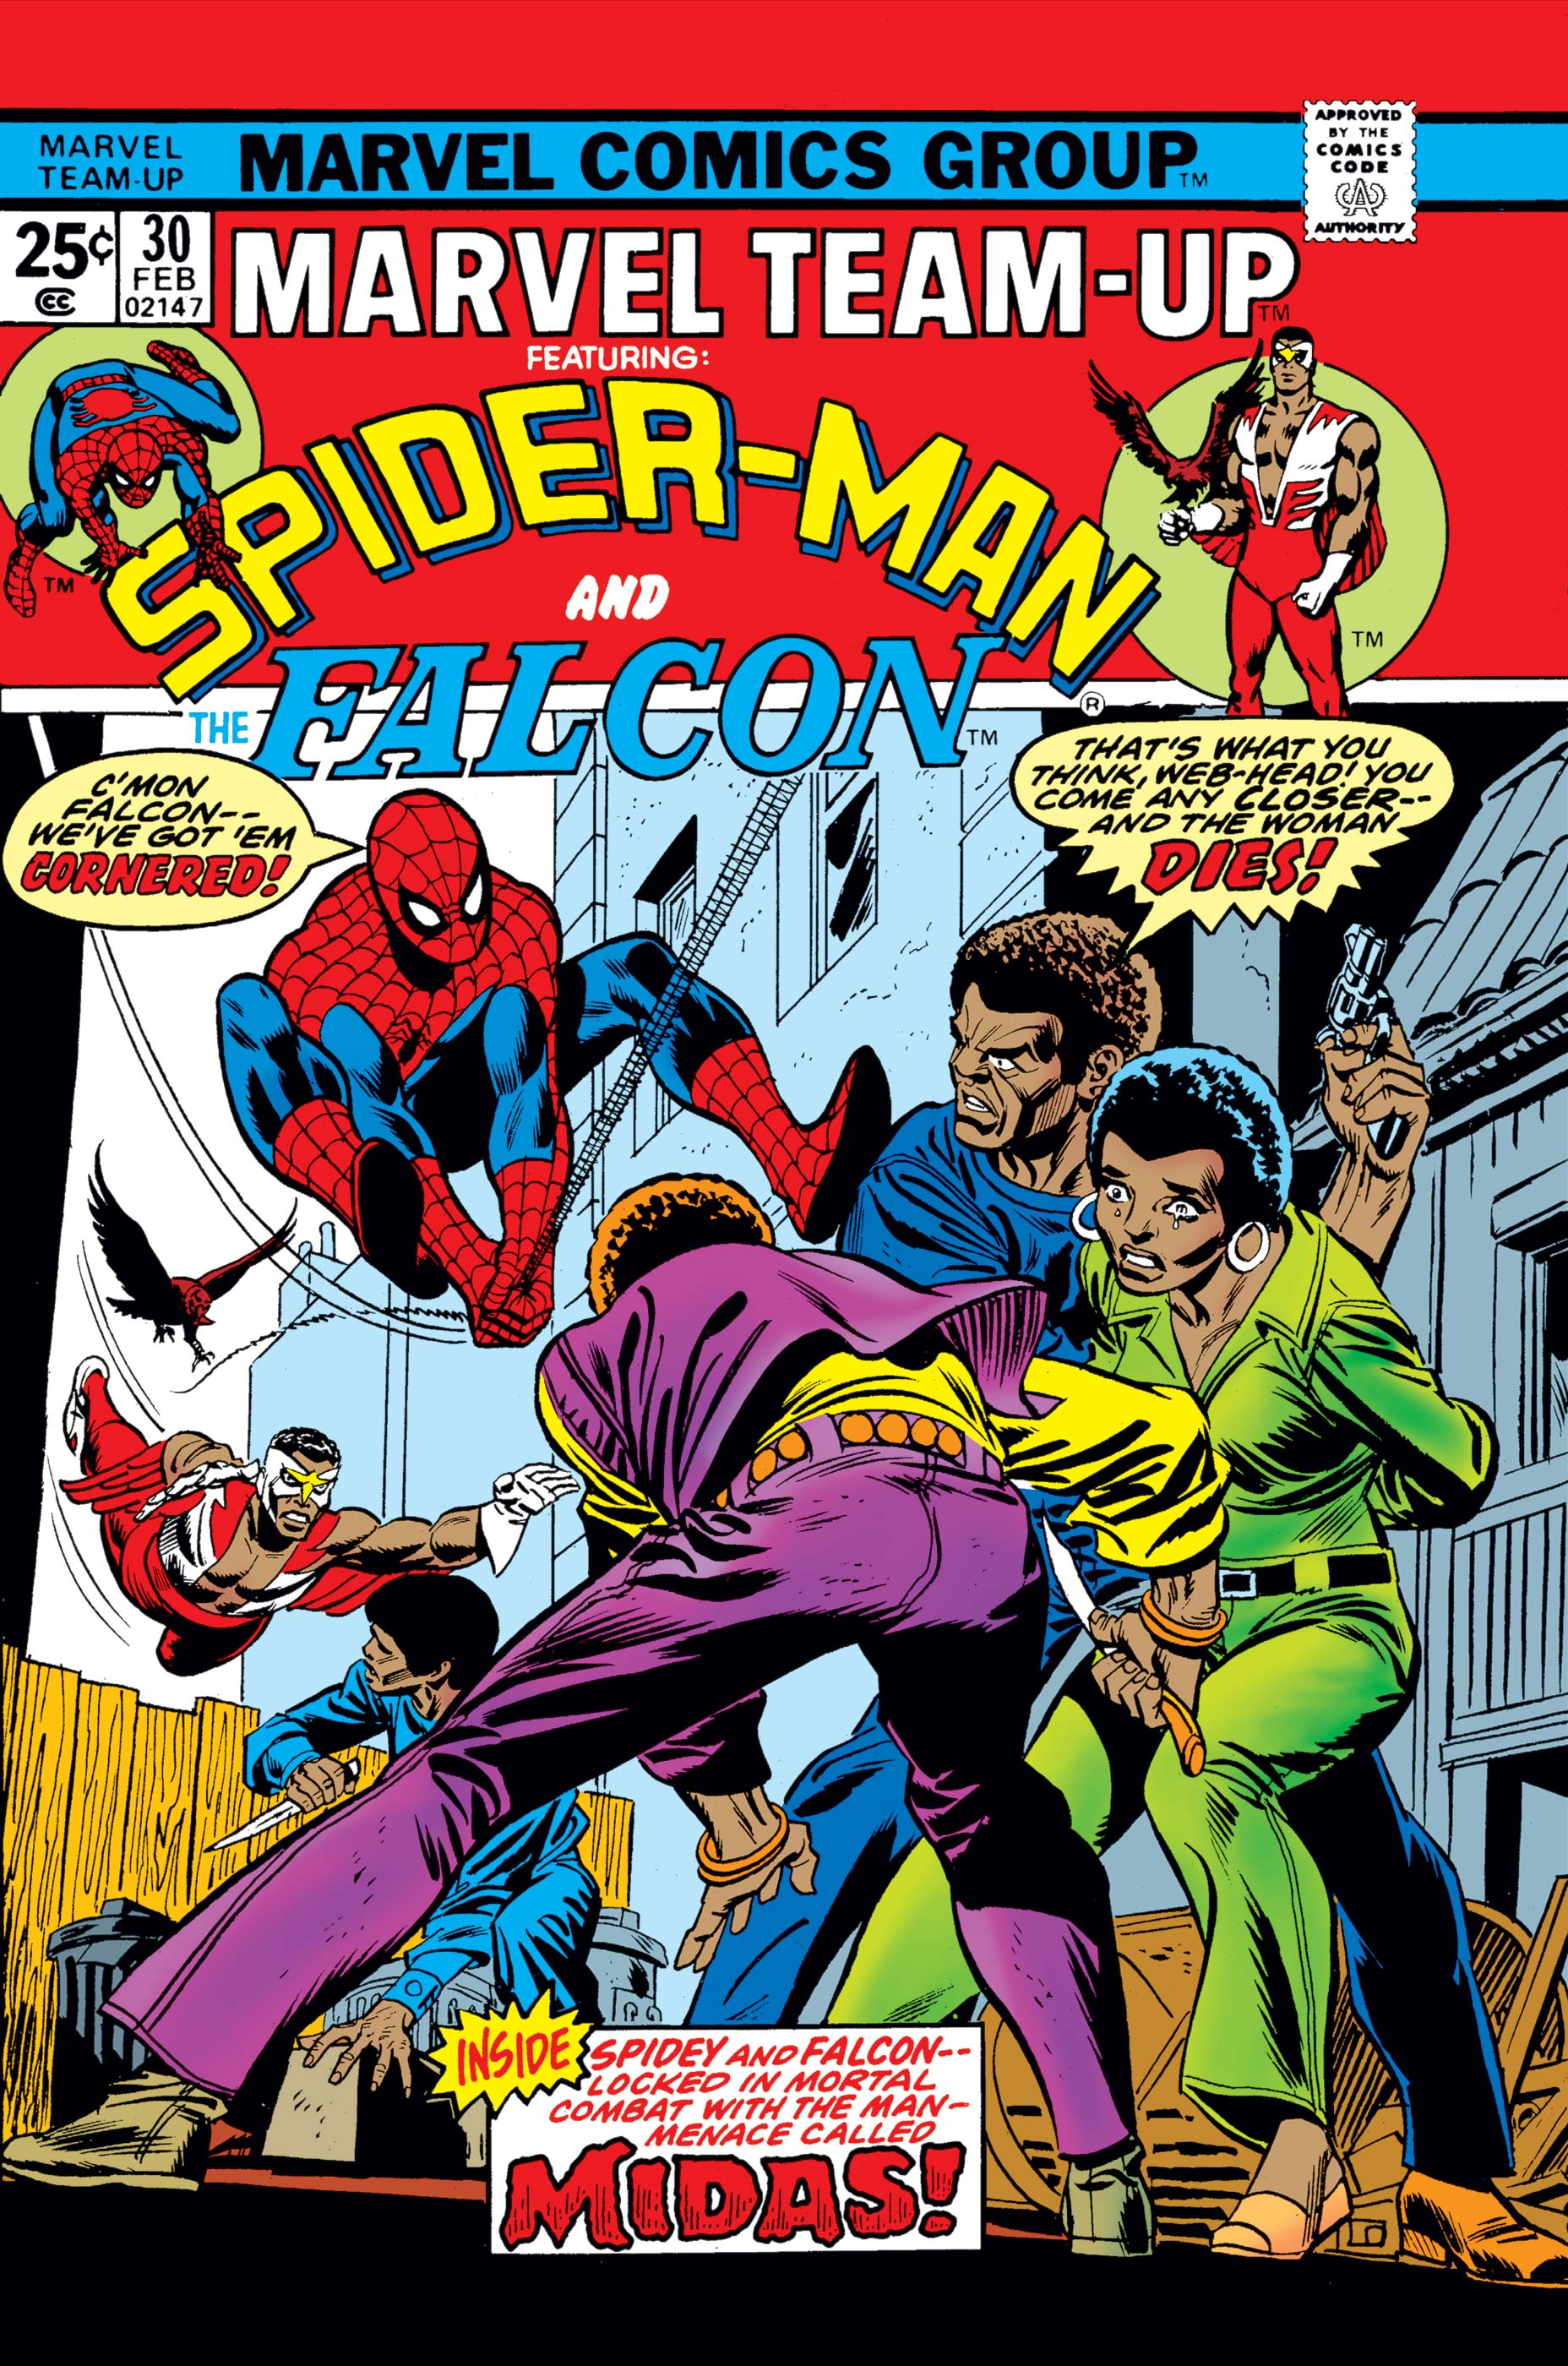 Marvel Team-Up (1972) #30